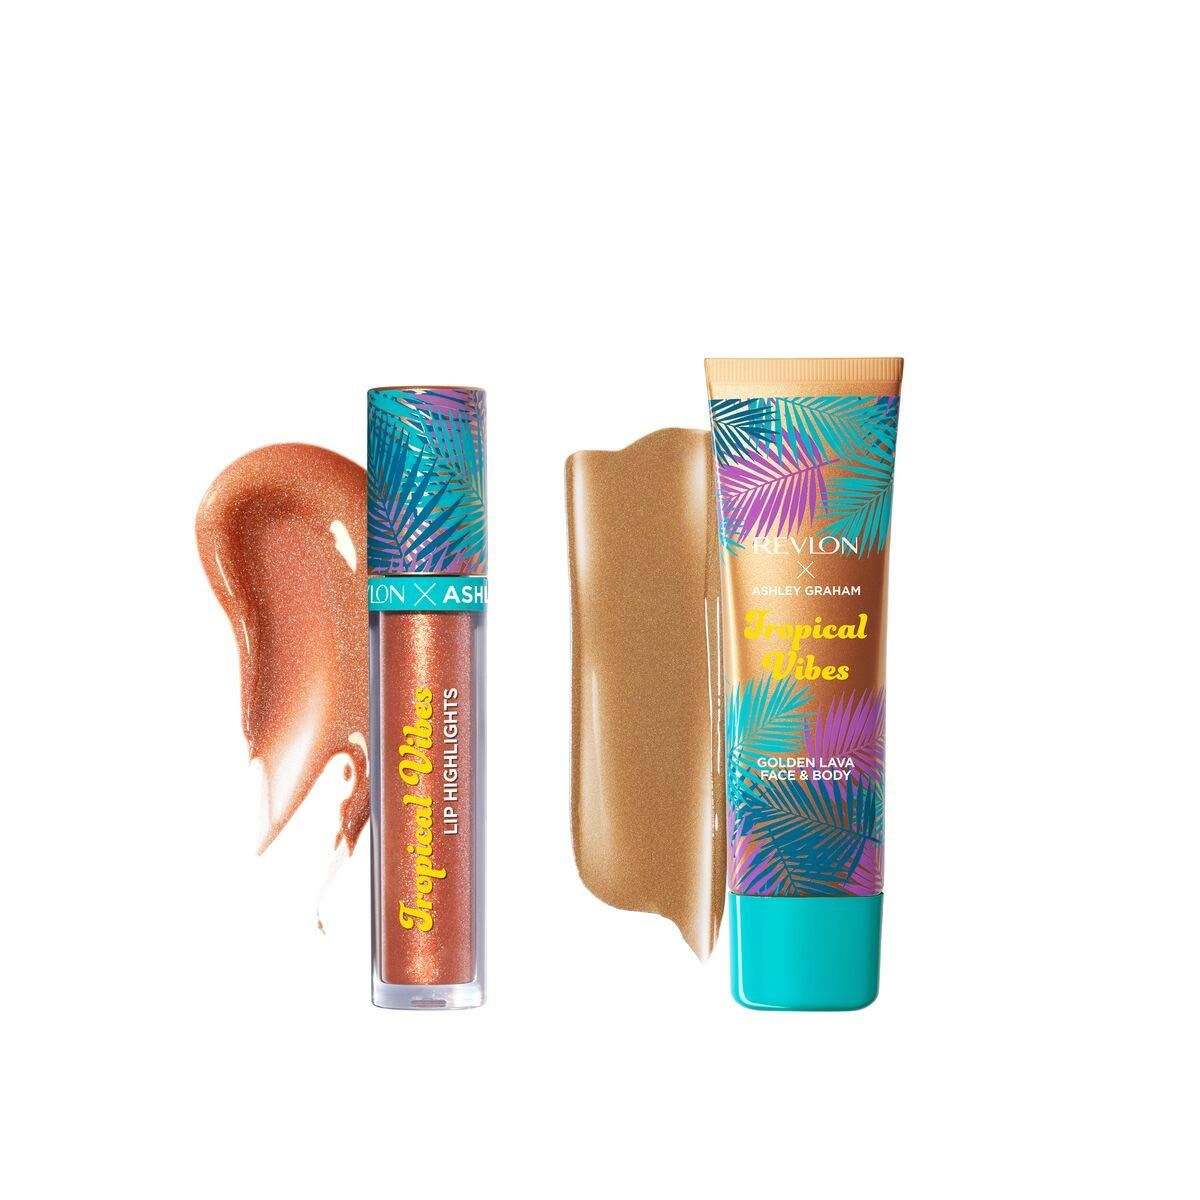 Revlon x Ashley Graham Tropical Vibes Makeup Kit